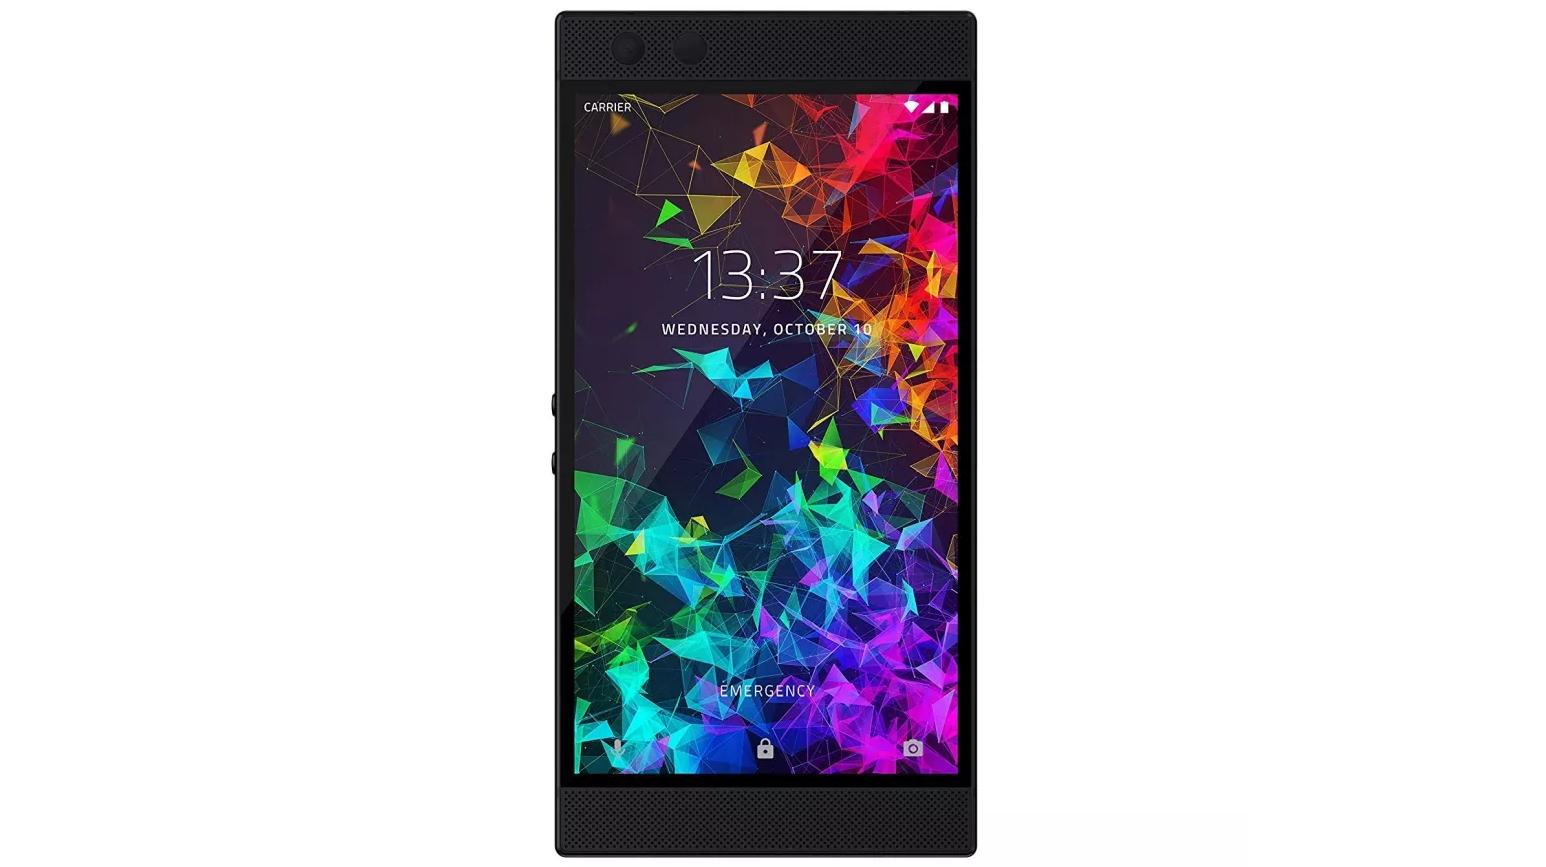 A Razer Phone 2 against a white background